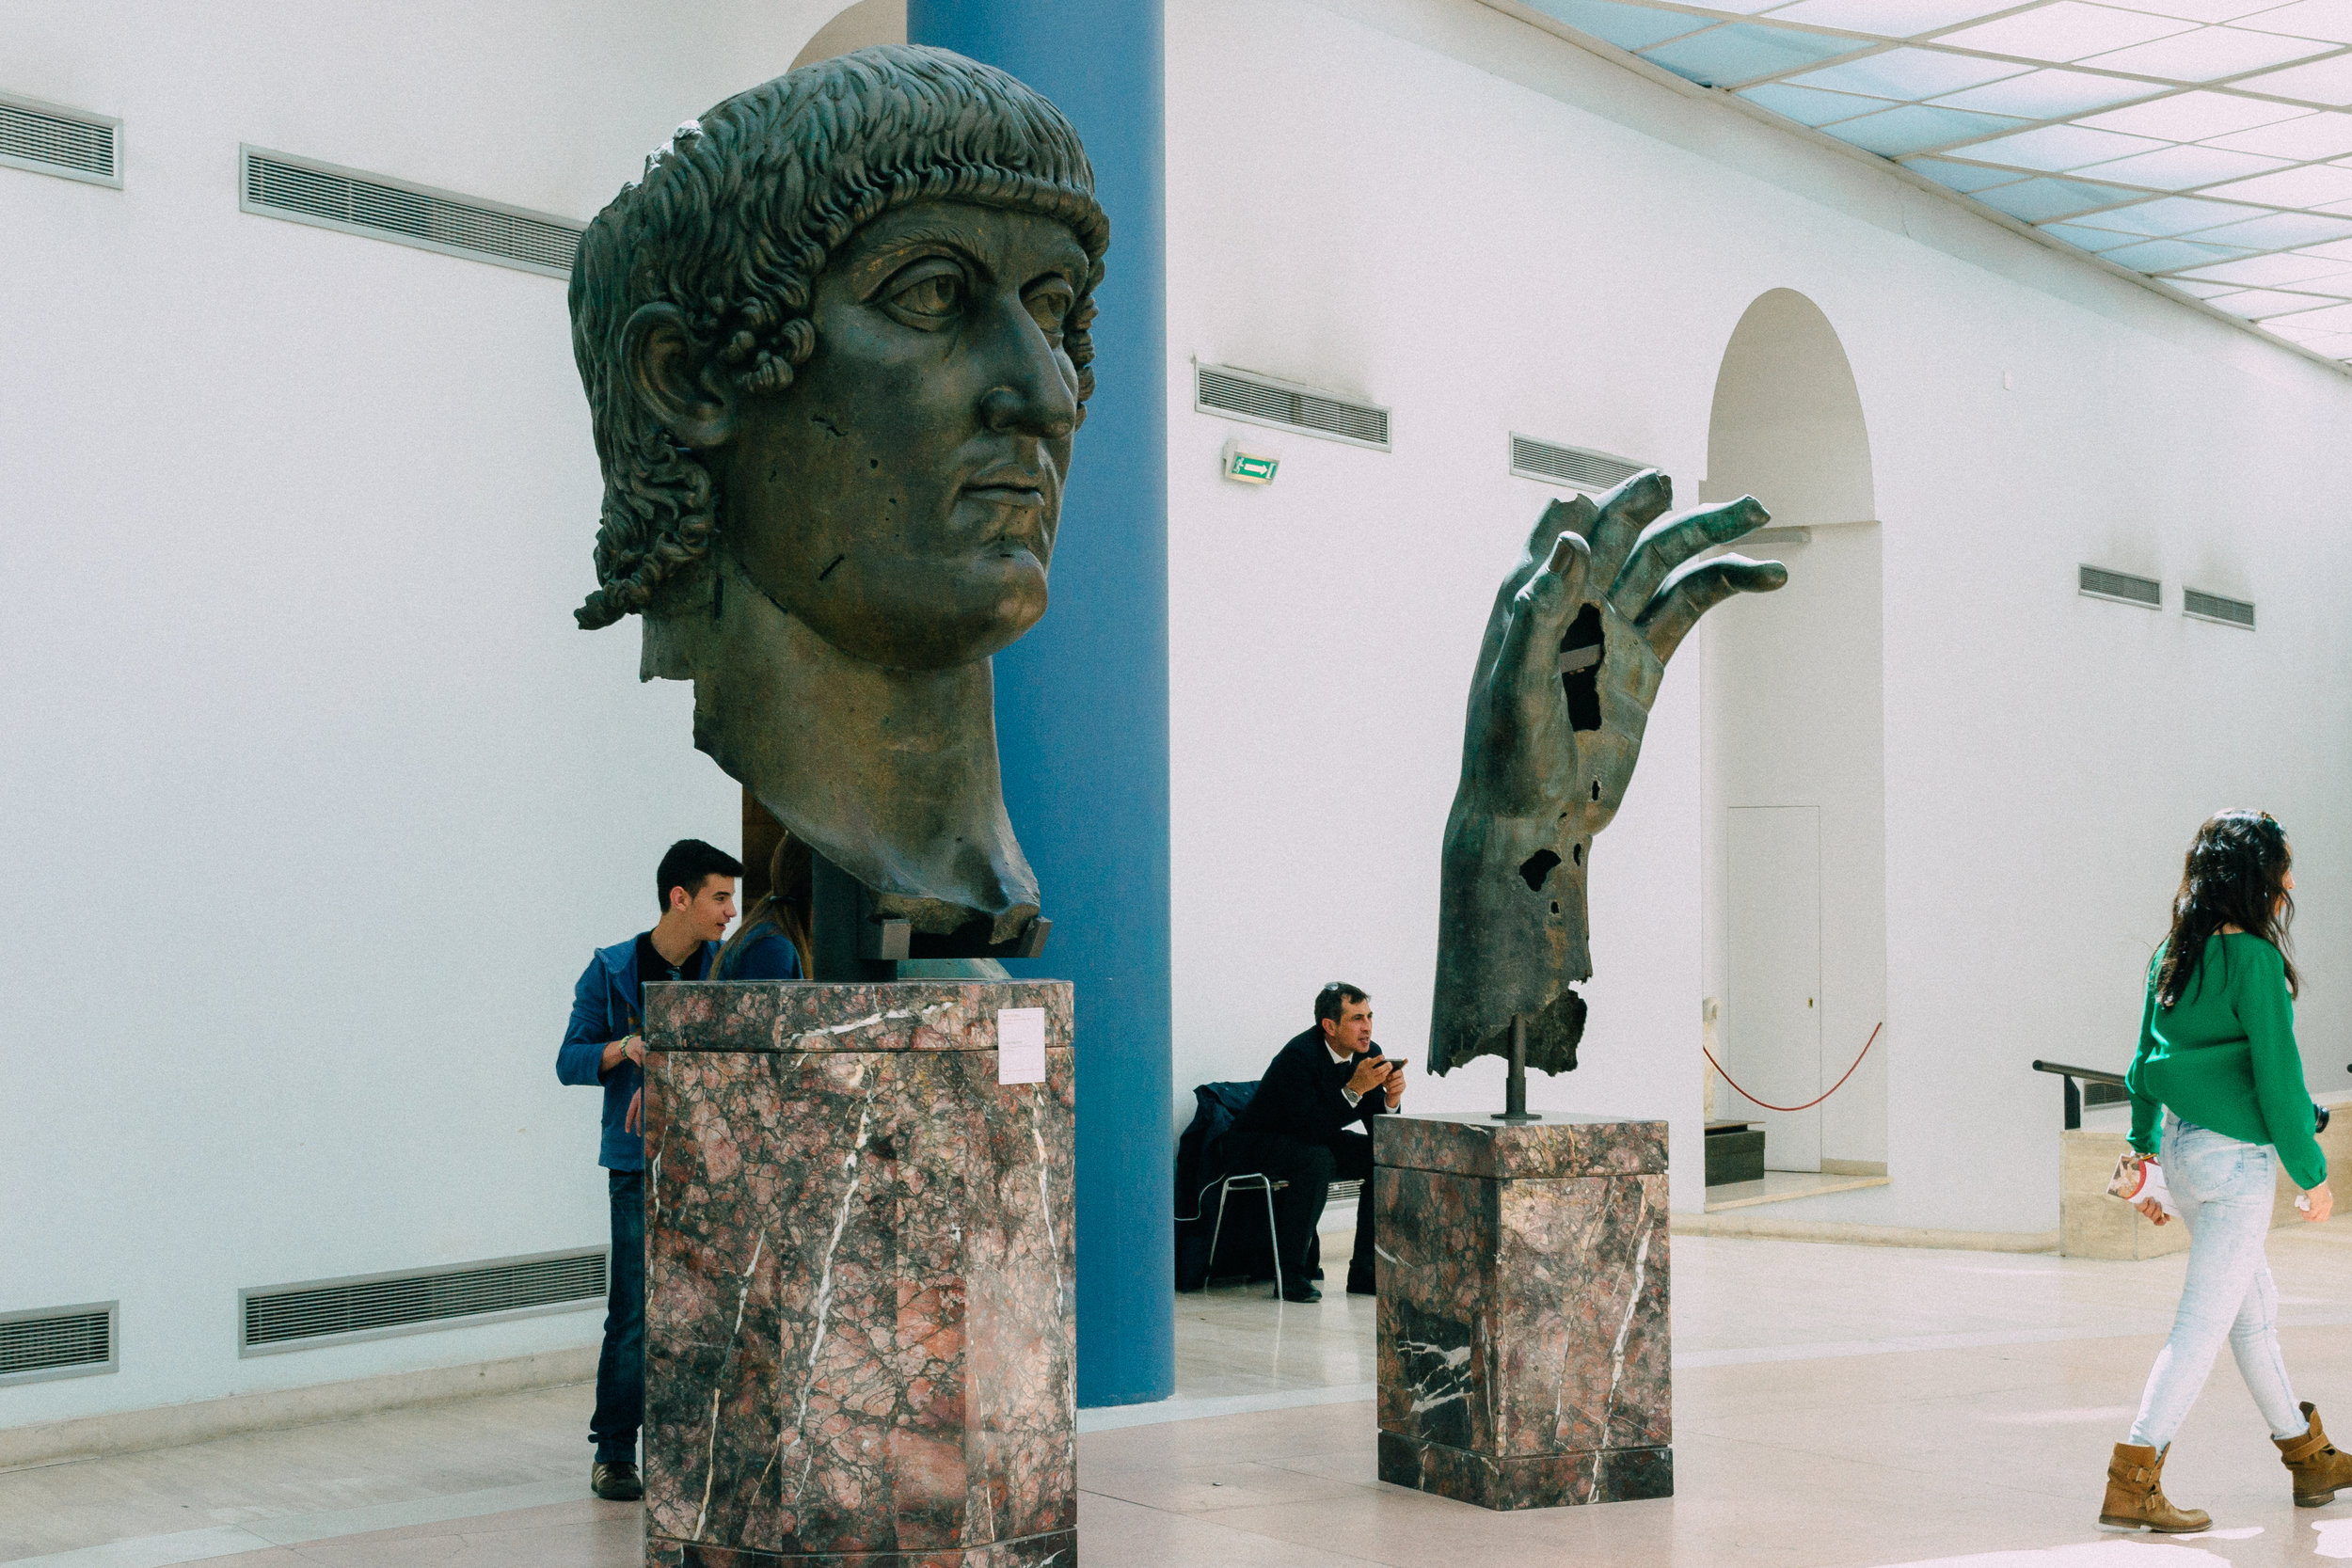 RManning_CapitolineMuseo.JPG